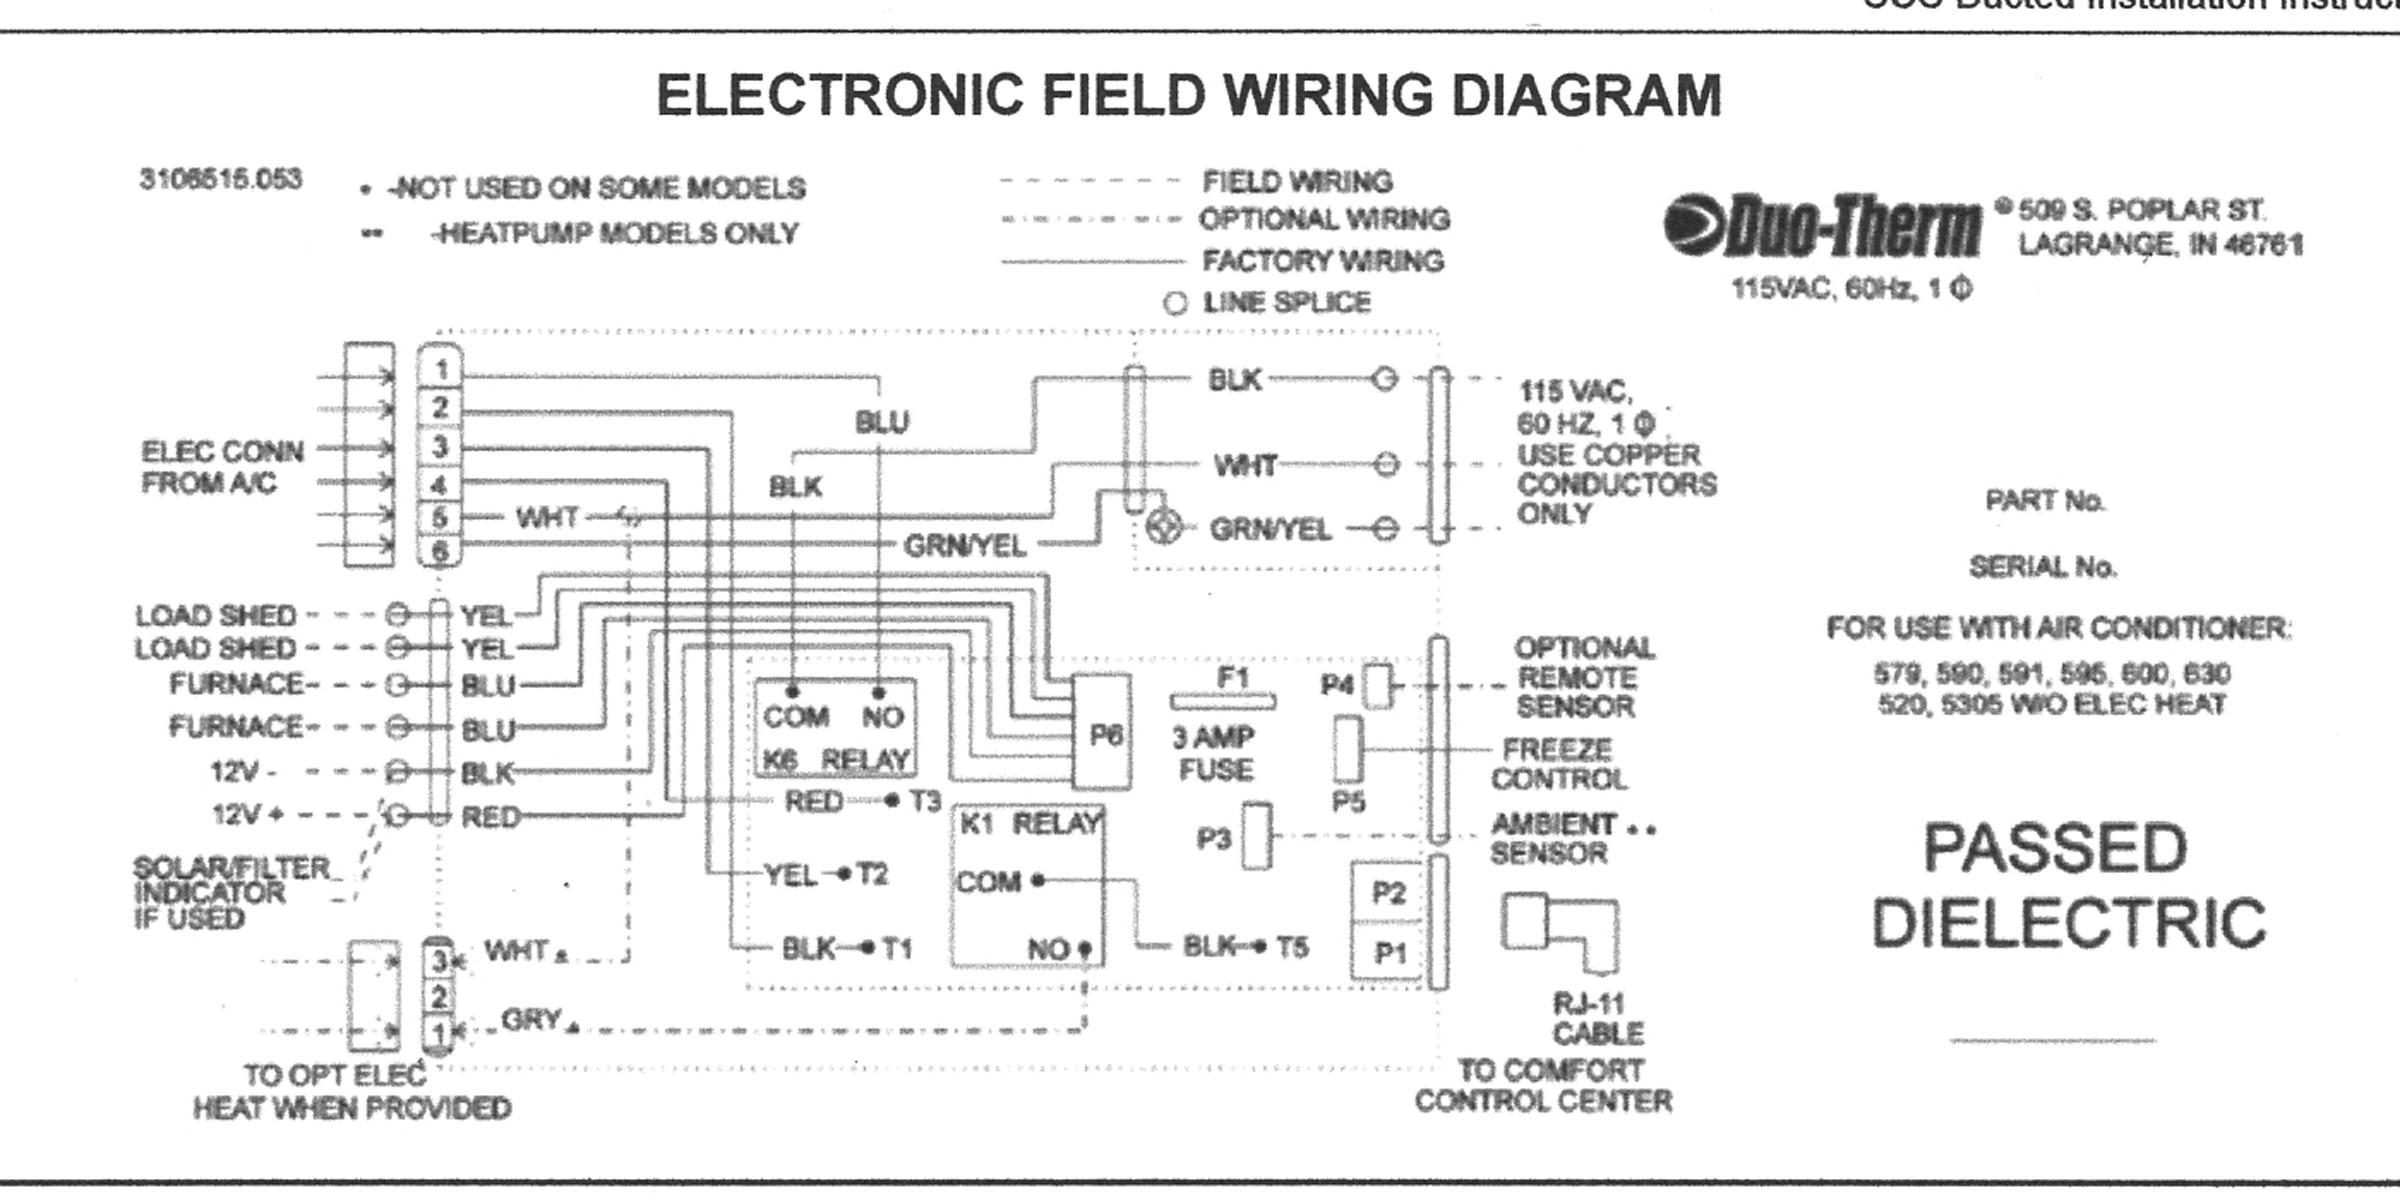 Thermostat Wiring Diagram Air Conditioner Reference Thermostat - Air Conditioner Thermostat Wiring Diagram